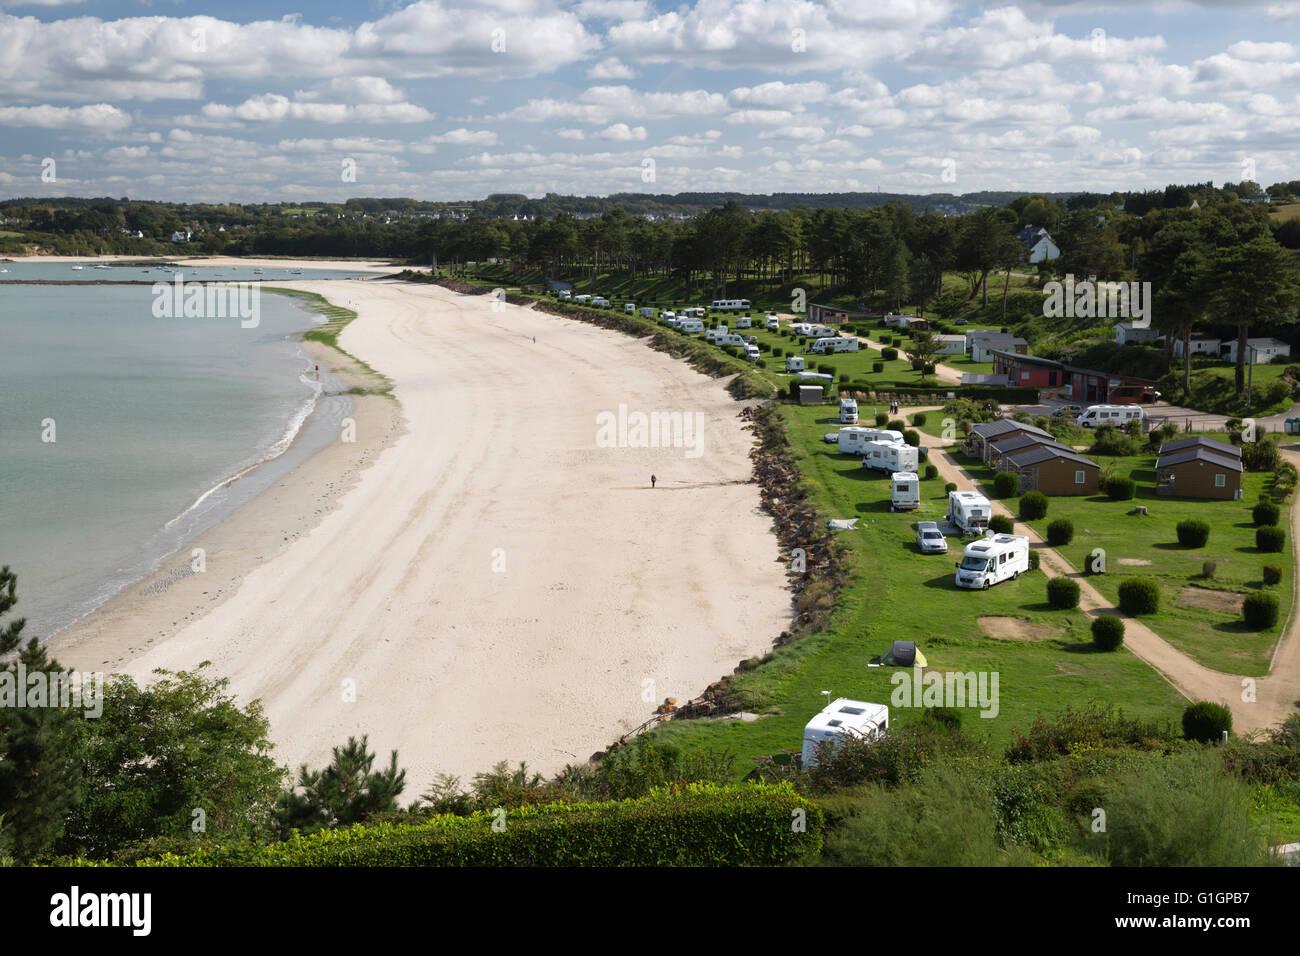 Camping du fond de la Baie camping, Locquirec, Finistère, Bretagne, France, Europe Photo Stock